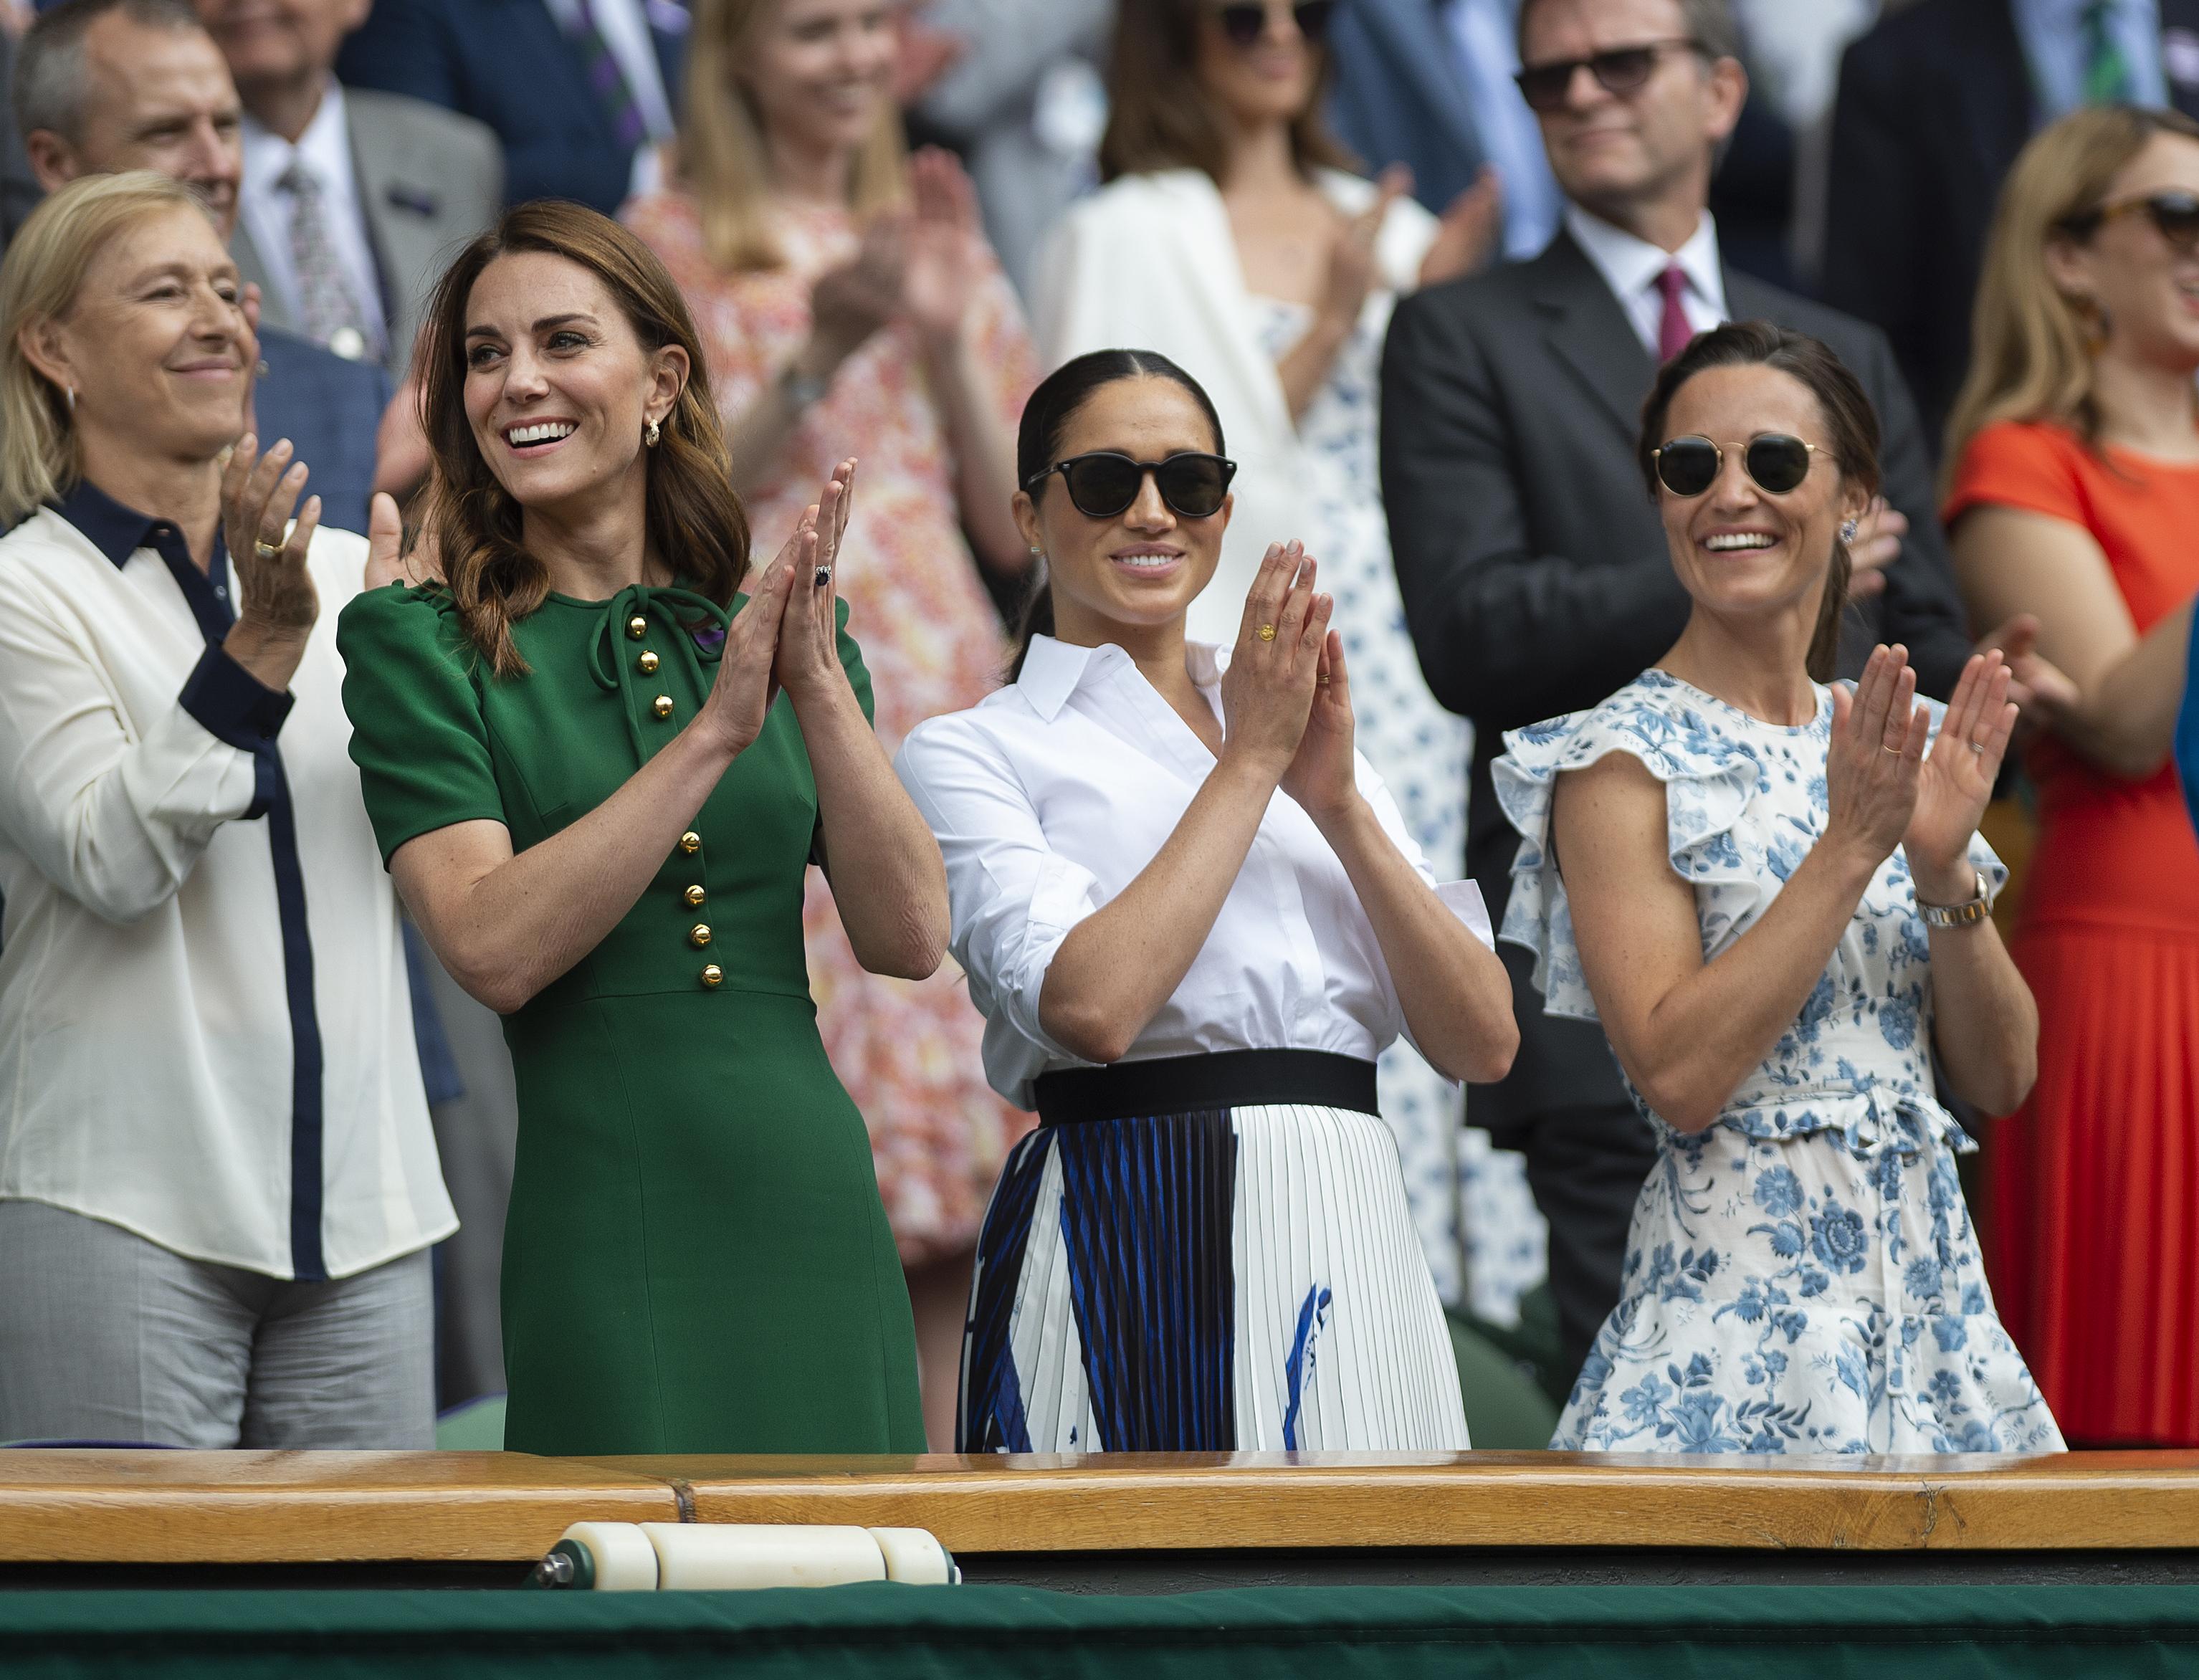 Pippa Middleton, Kate Middleton, Meghan Markle